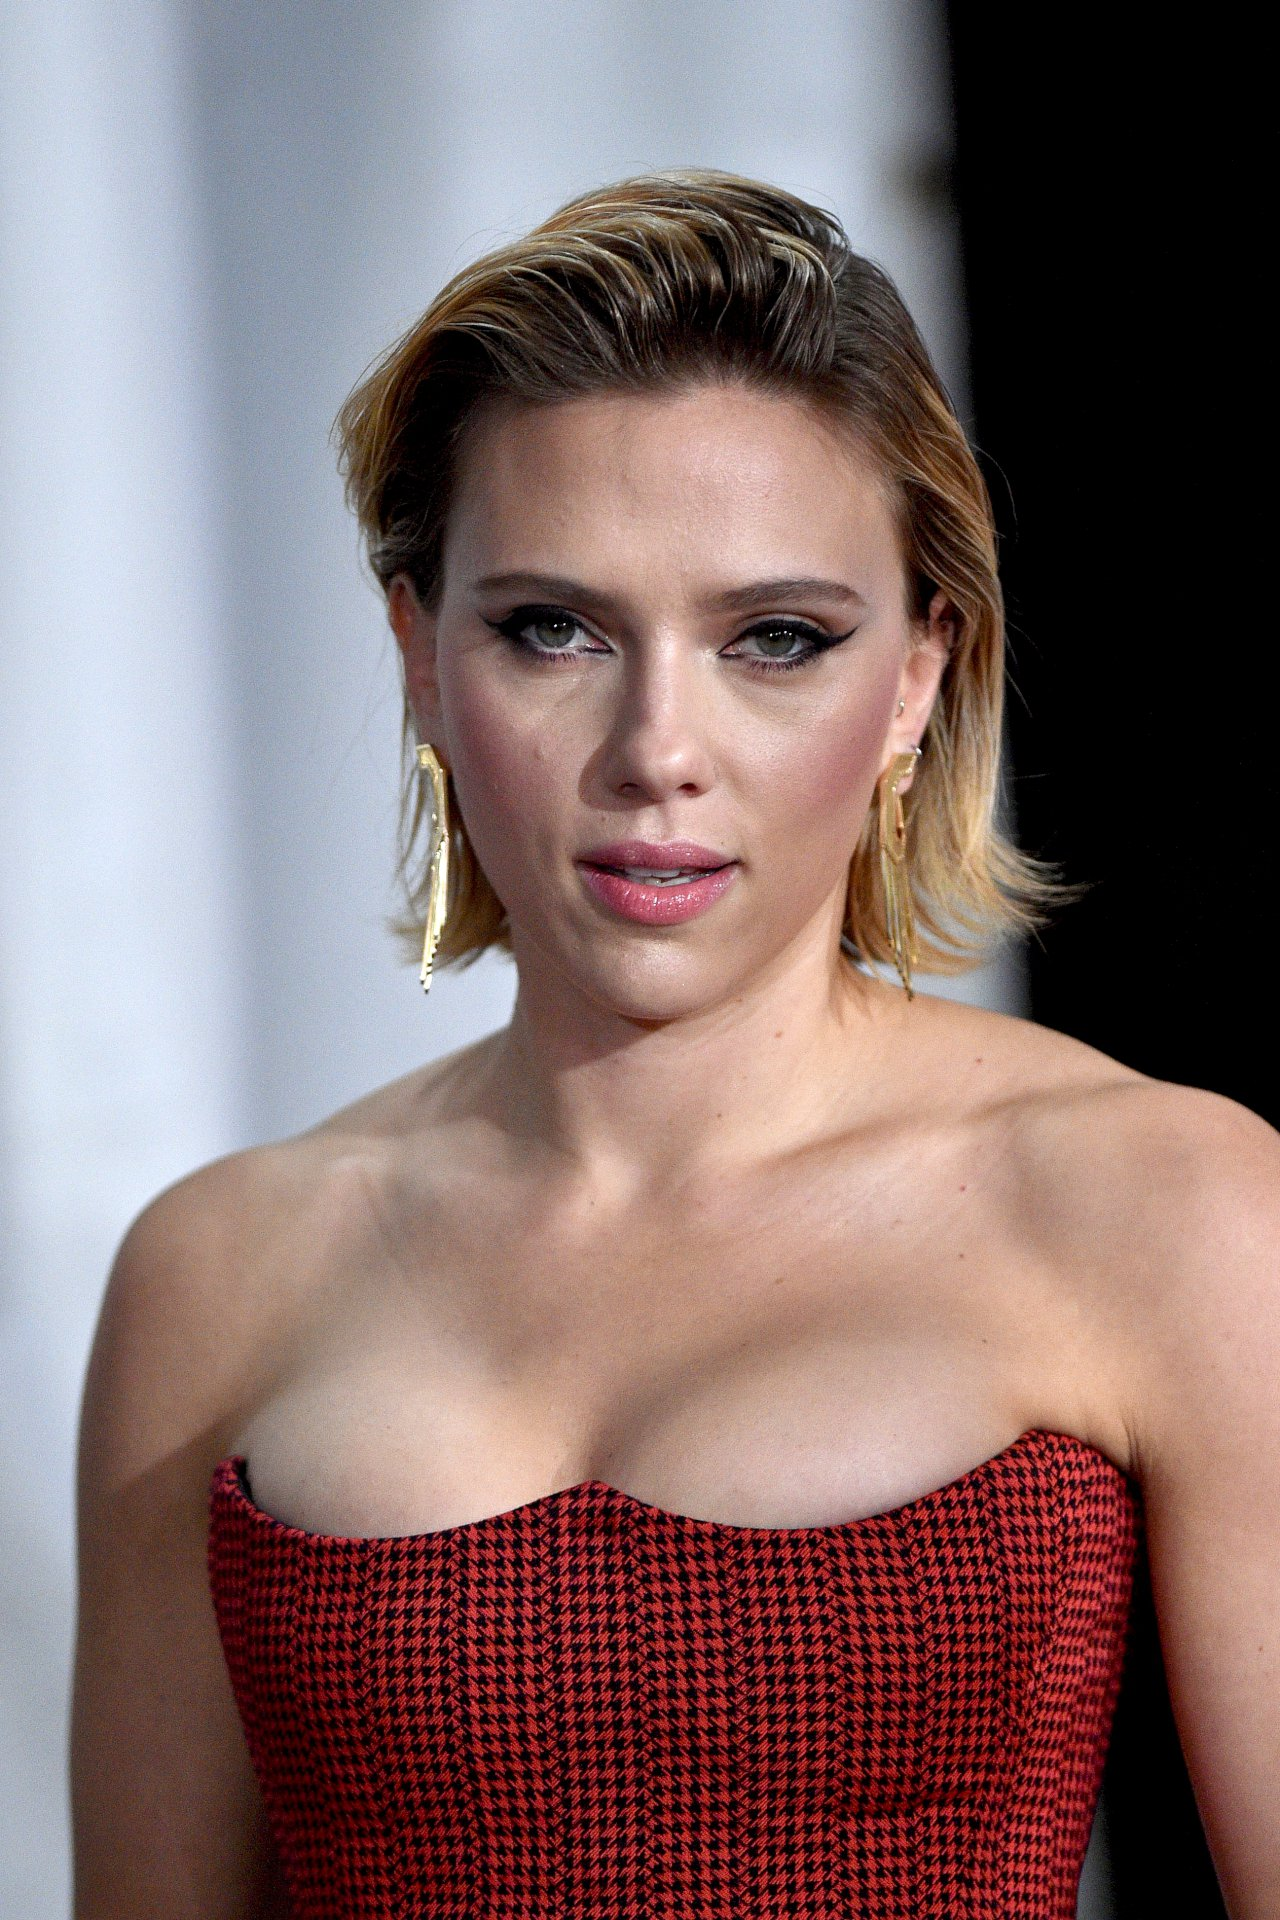 Scarlett Johansson Sexy Big Cleavage | Hot Celebs Home